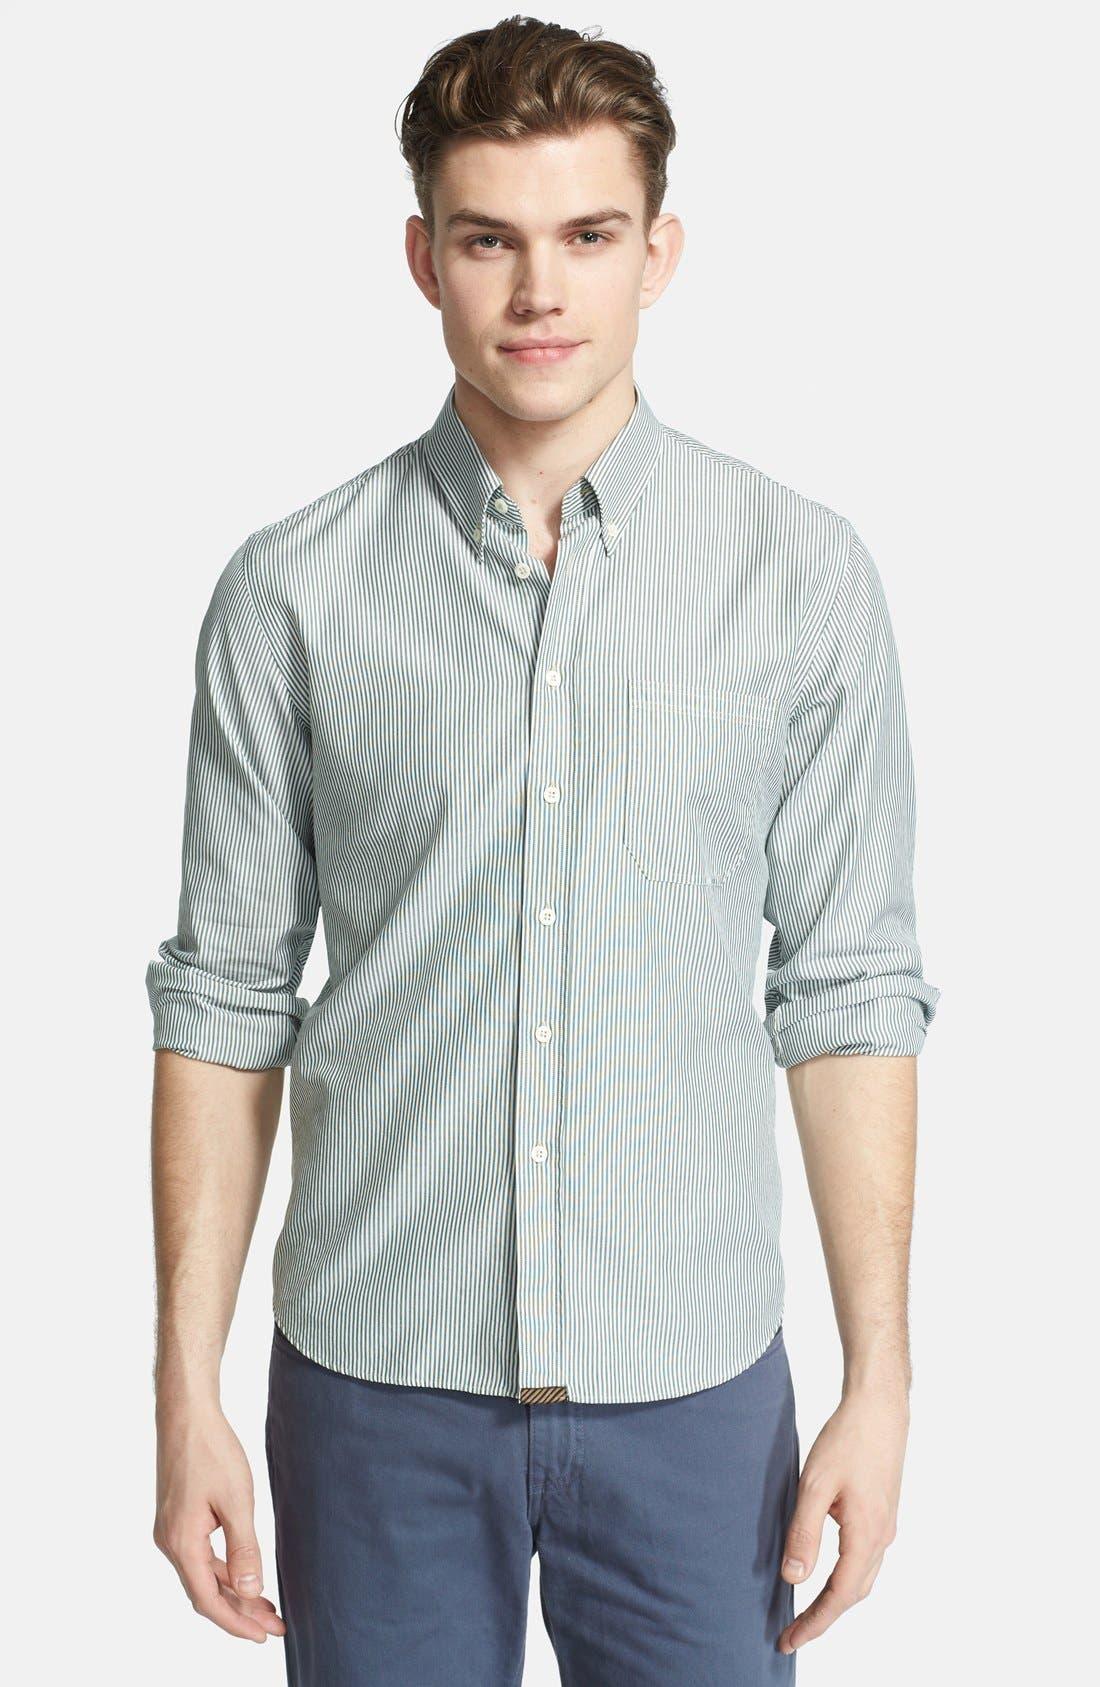 Alternate Image 1 Selected - Billy Reid 'Tuscumbia' Stripe Shirt